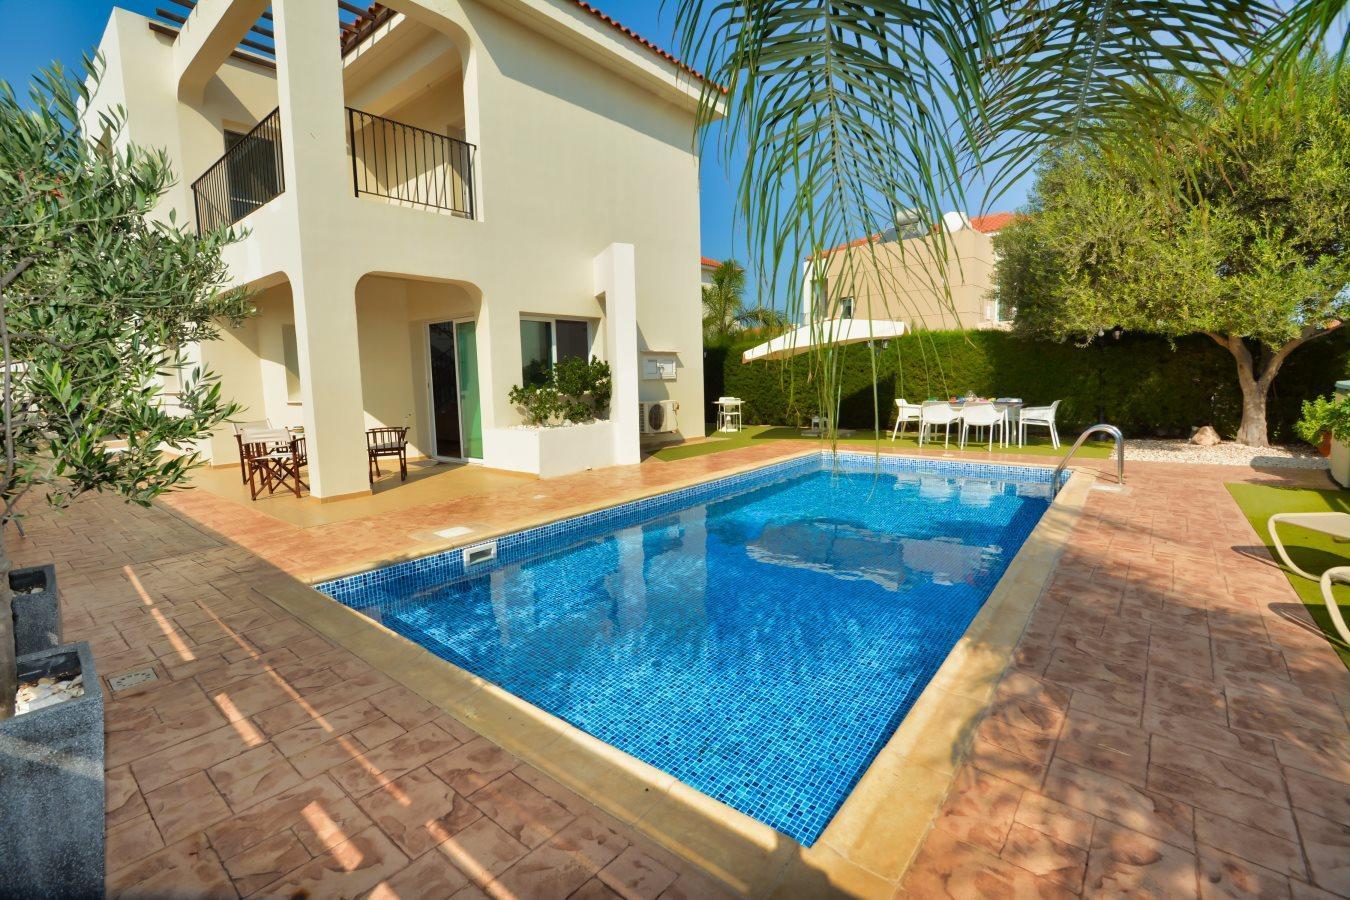 Island Villas Cyprus 020 A Family Friendly Villa